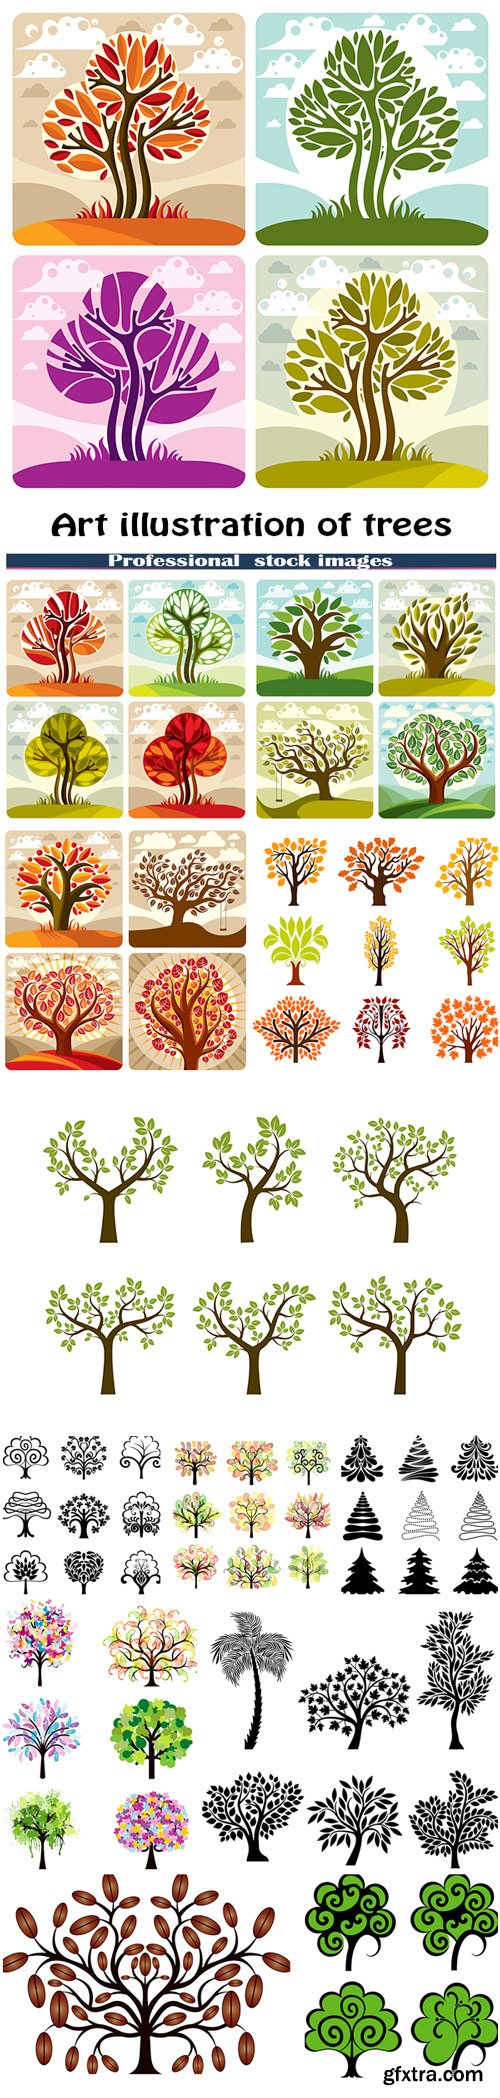 Art illustration of trees